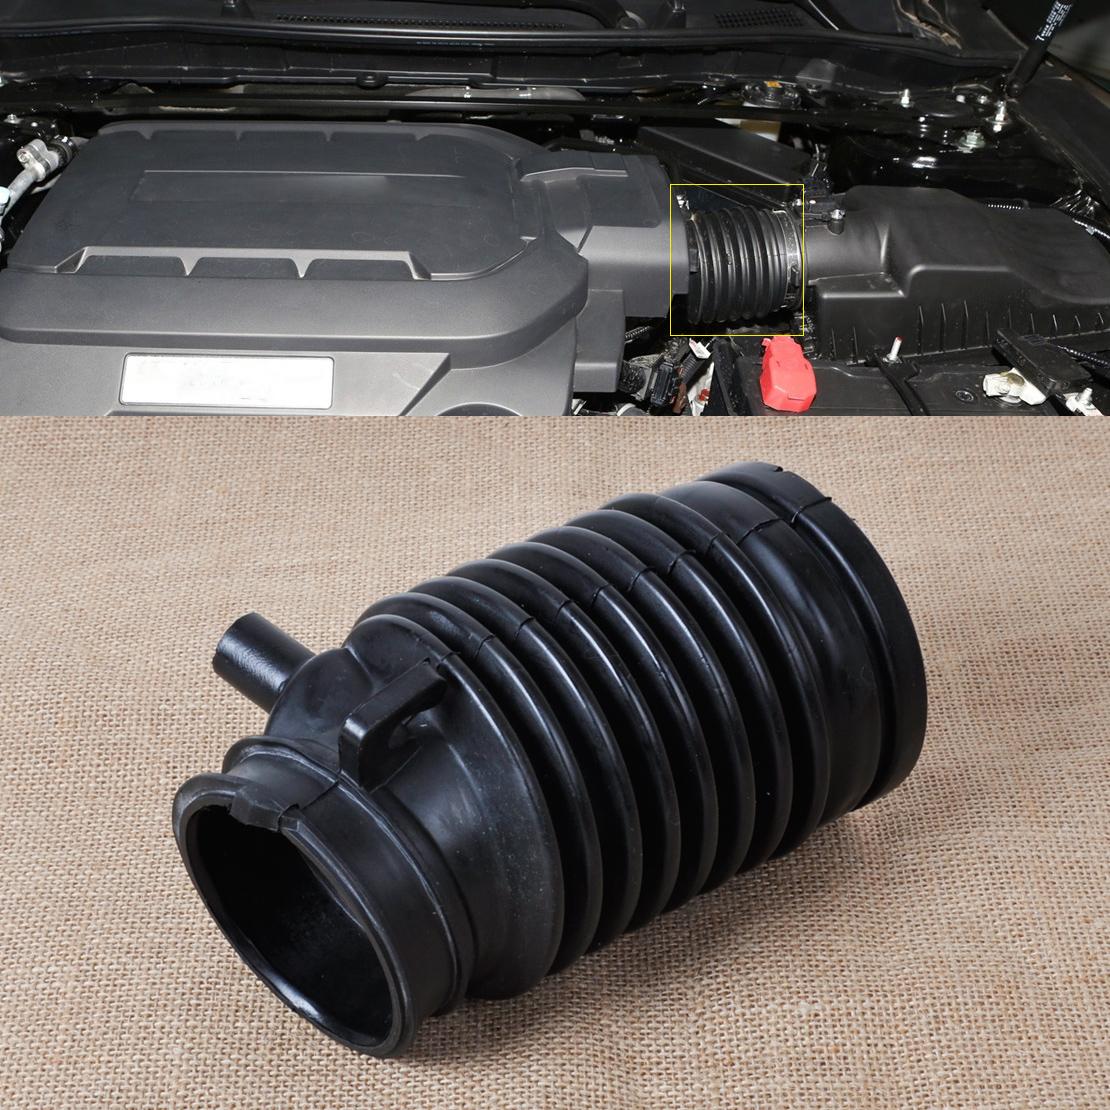 Hotsale Air Cleaner Intake Hose Tube For Honda Accord V6